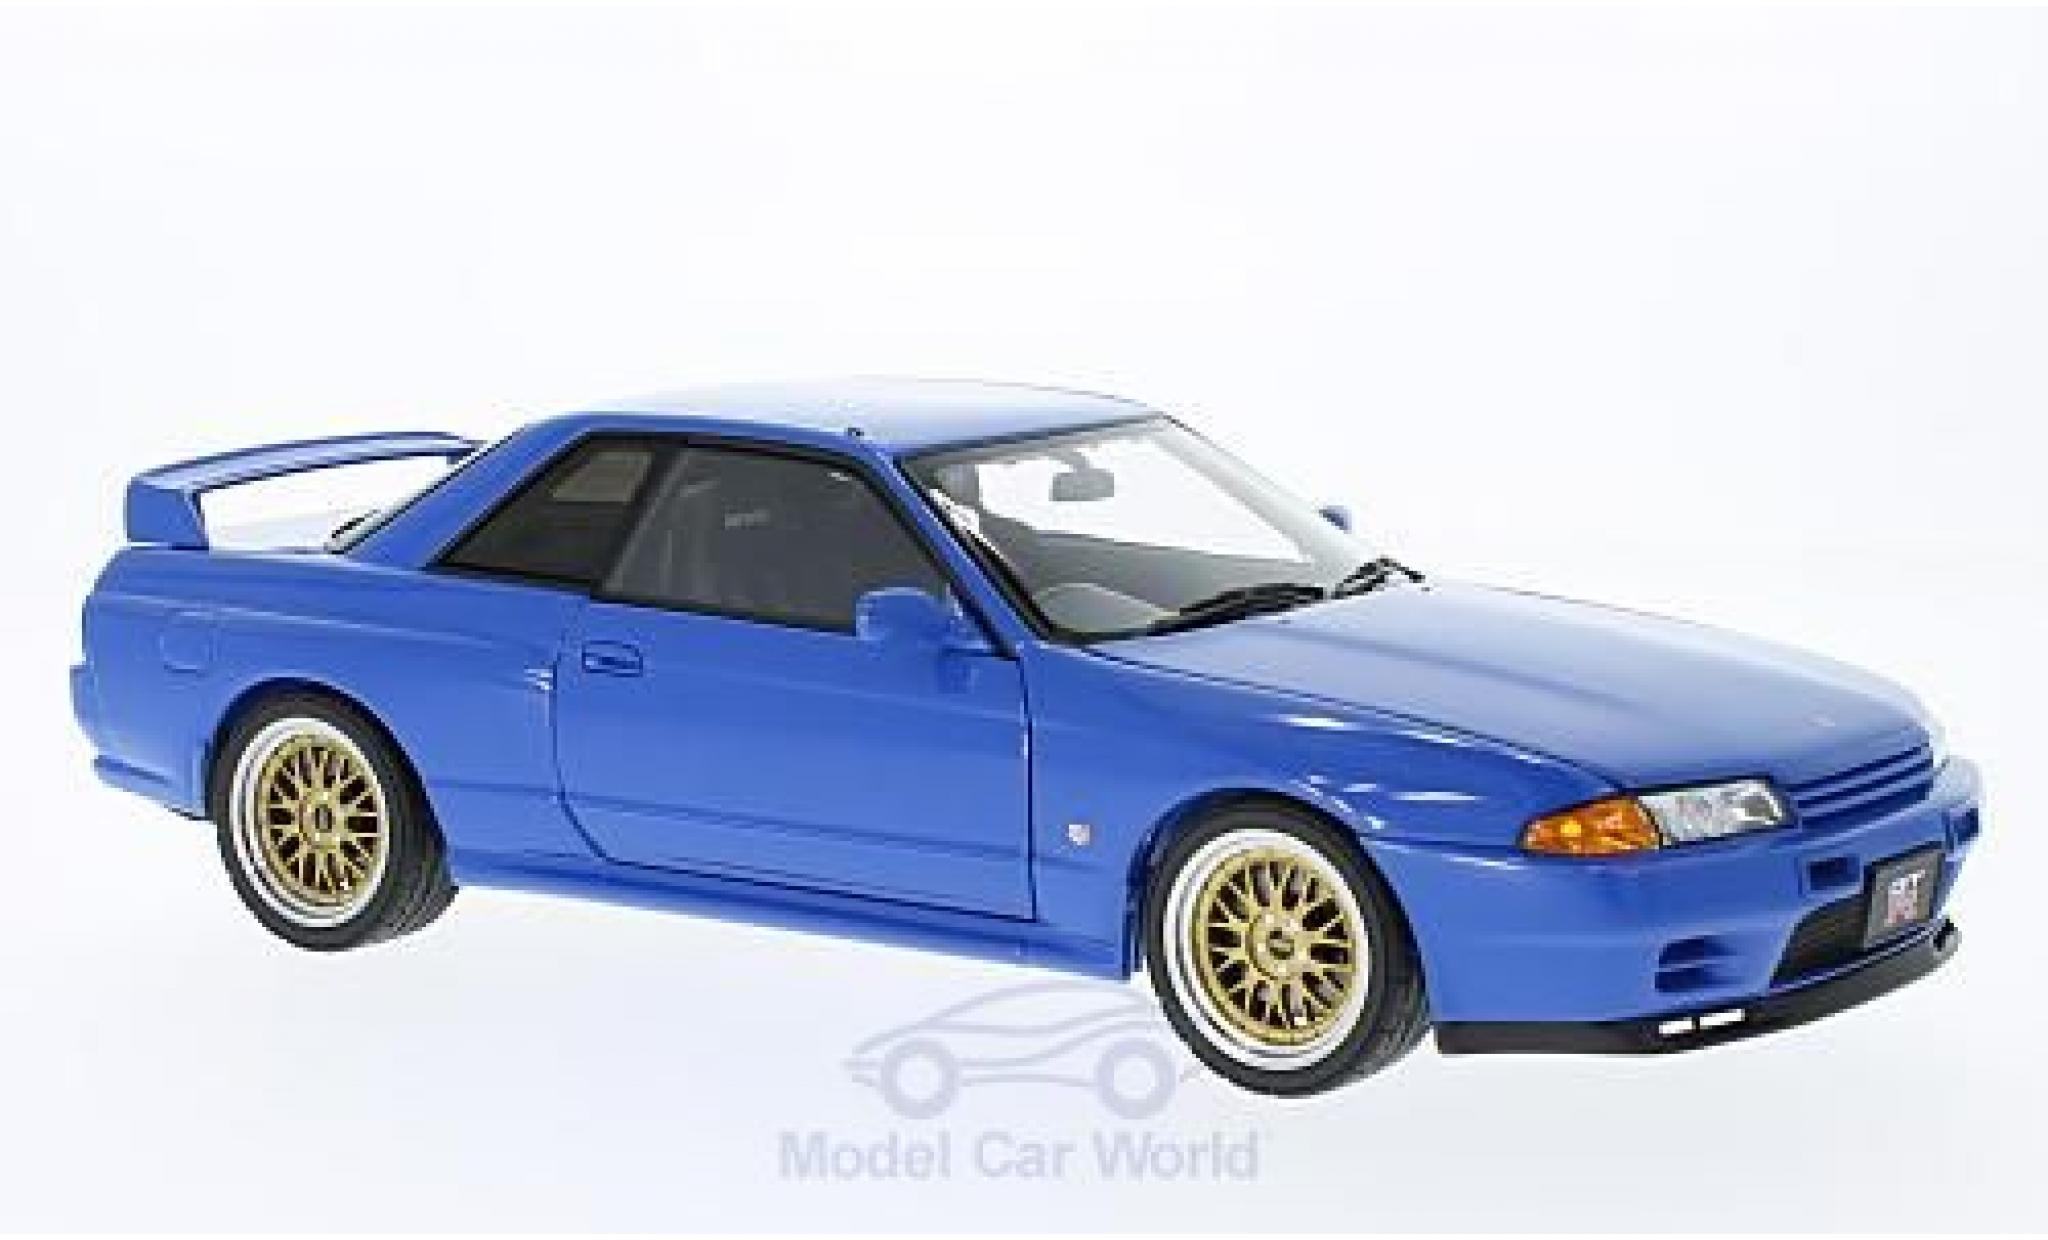 Nissan Skyline 1/18 AUTOart GT-R (R32) V-Spec II bleue RHD Tuned Version